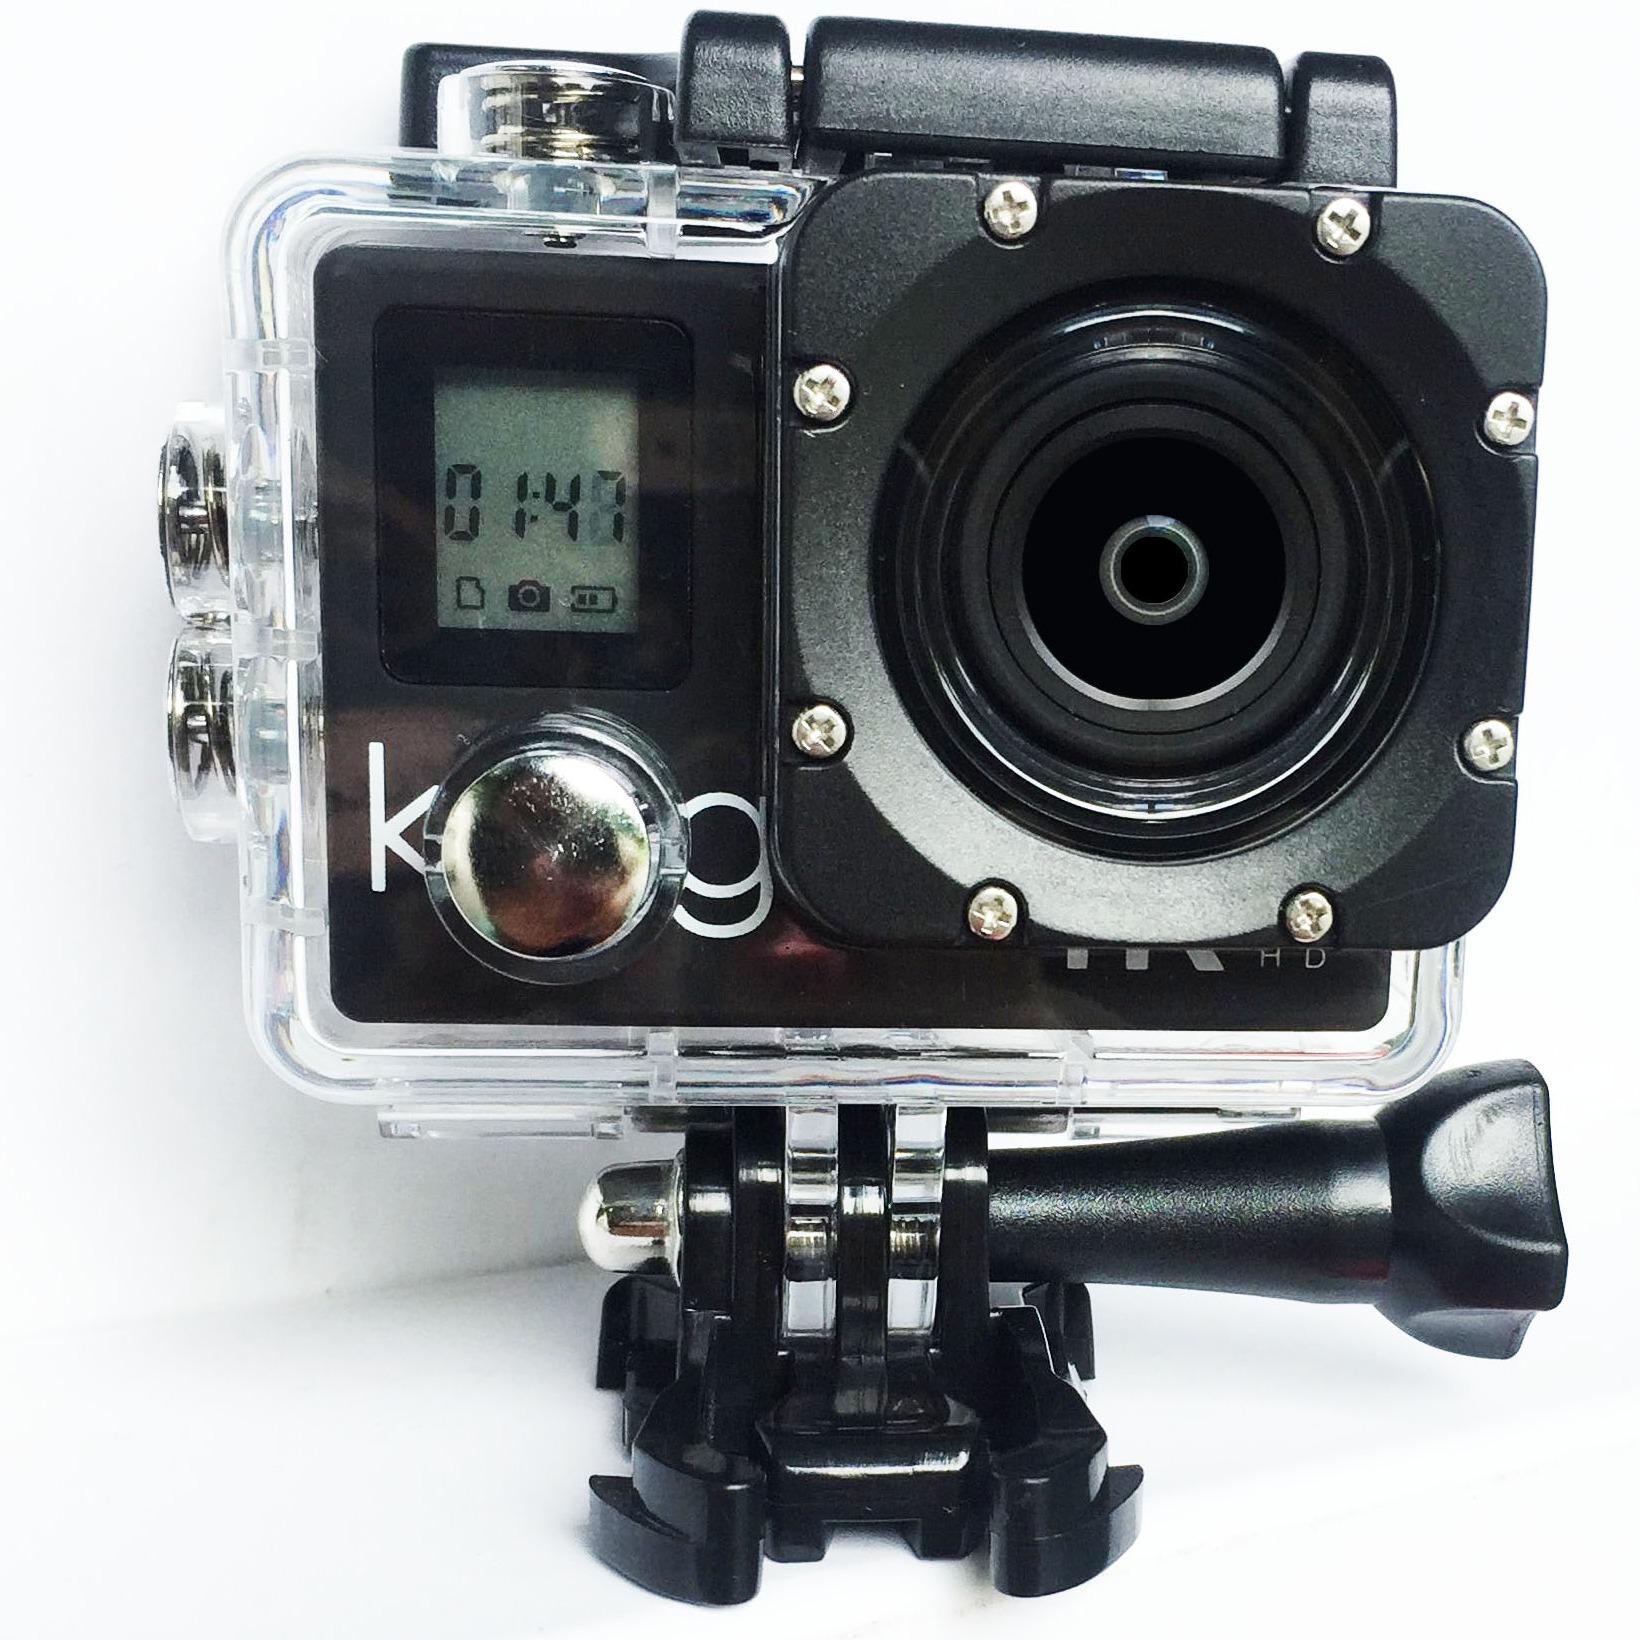 Kogan Action Camera 4K NV UltraHD - 16MP - Putih - WIFI